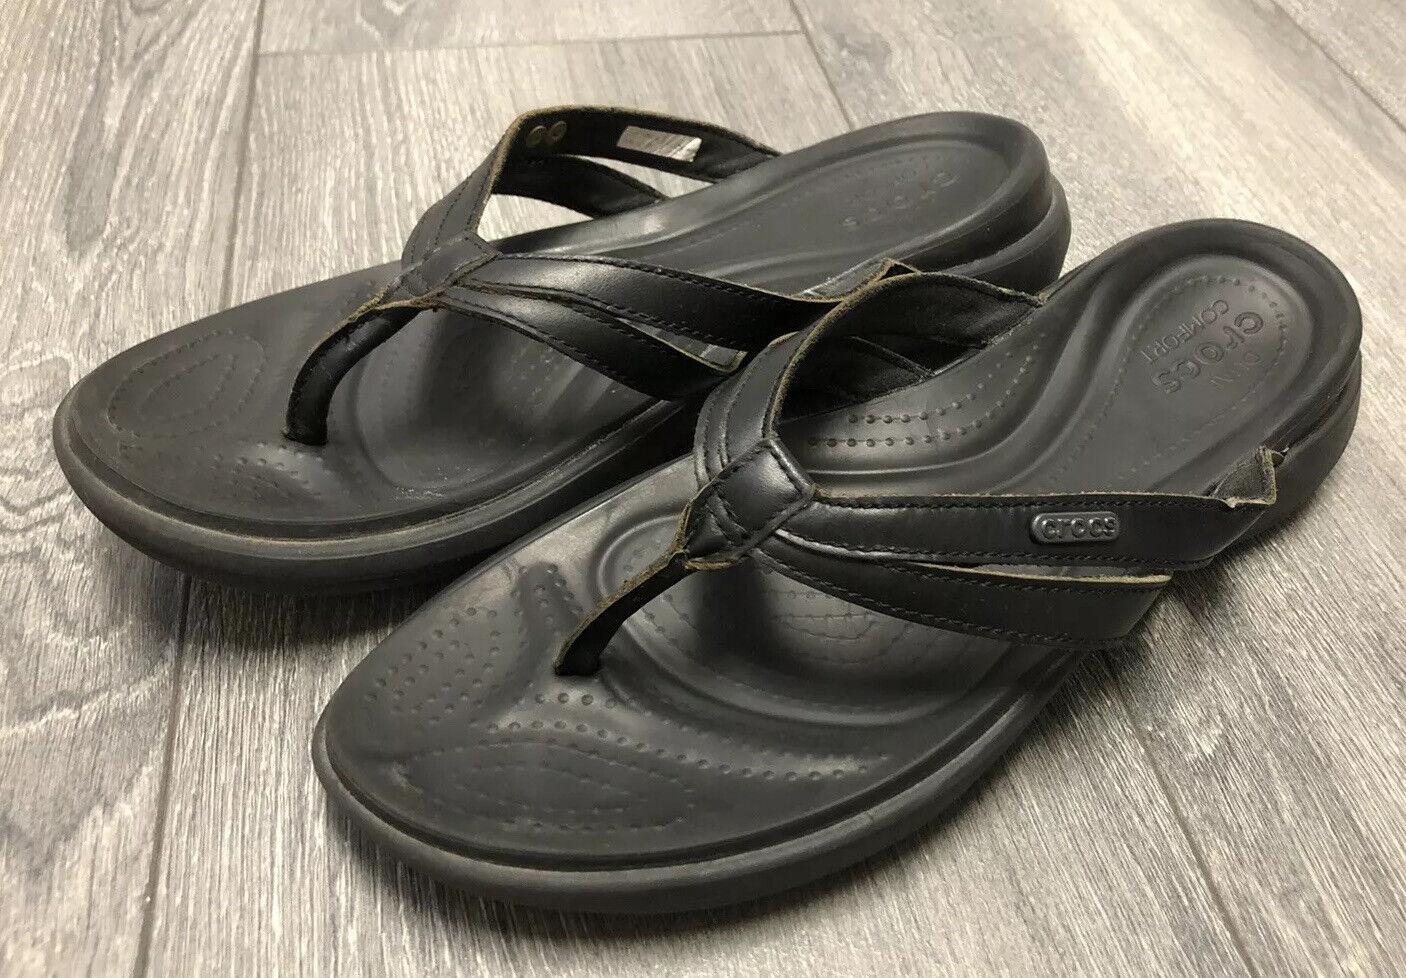 Crocs Dual Comfort Thong Sandals Leather Straps Solid Black Size 10